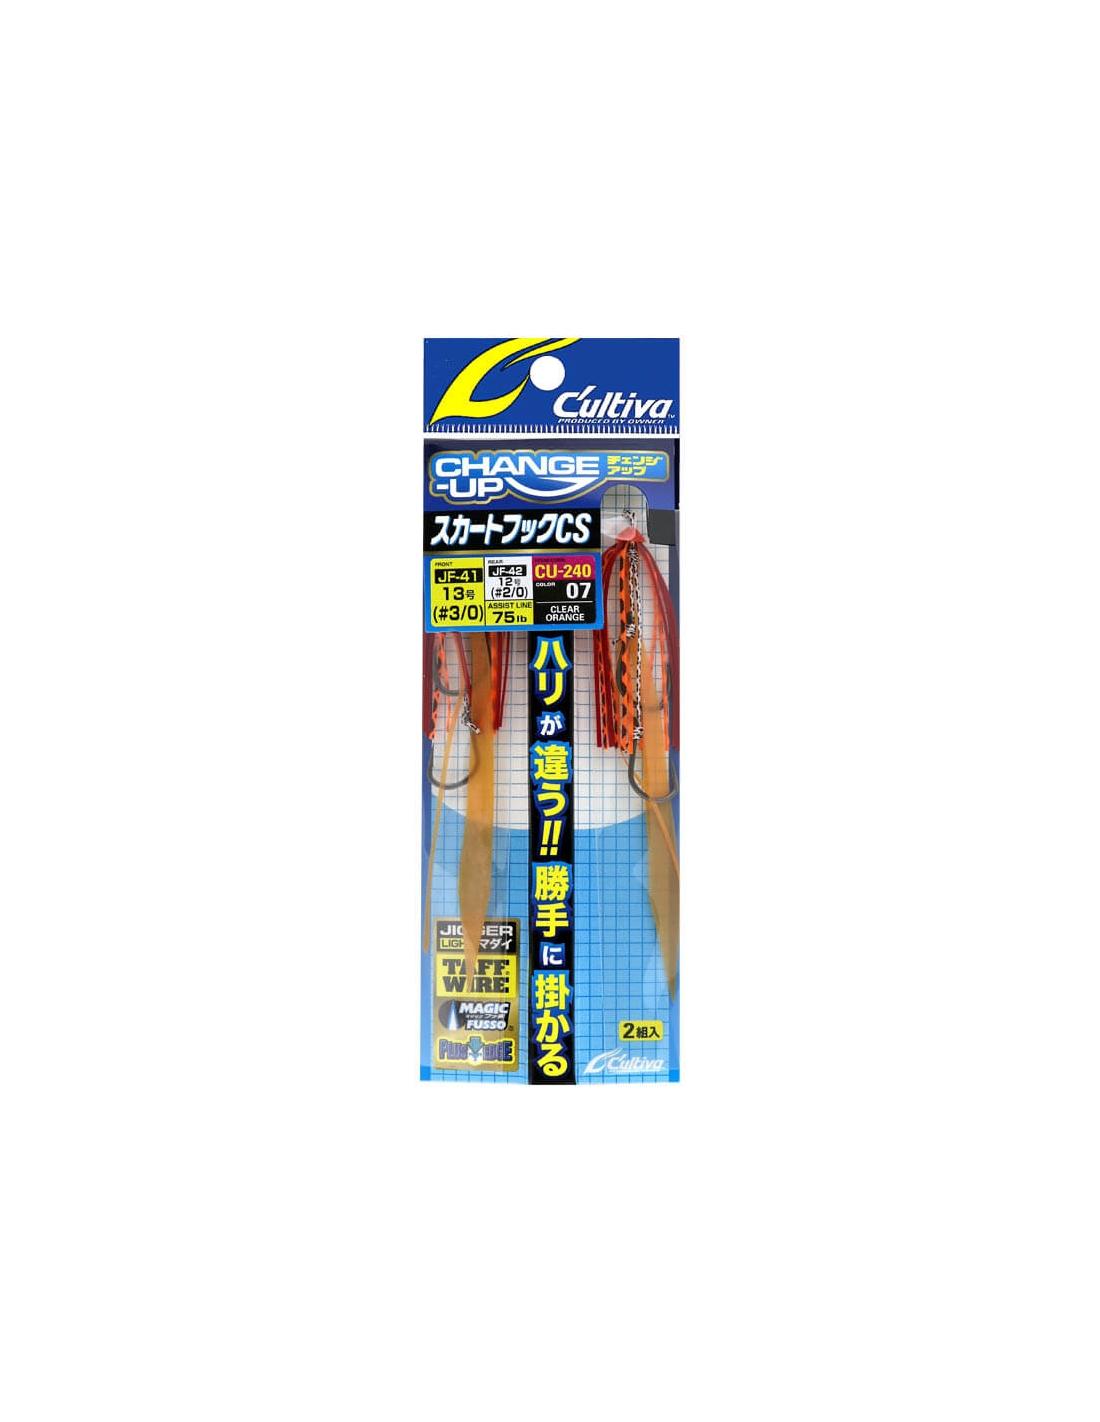 Tai Rubber Cultiva Skirt Hook CU-240 13217